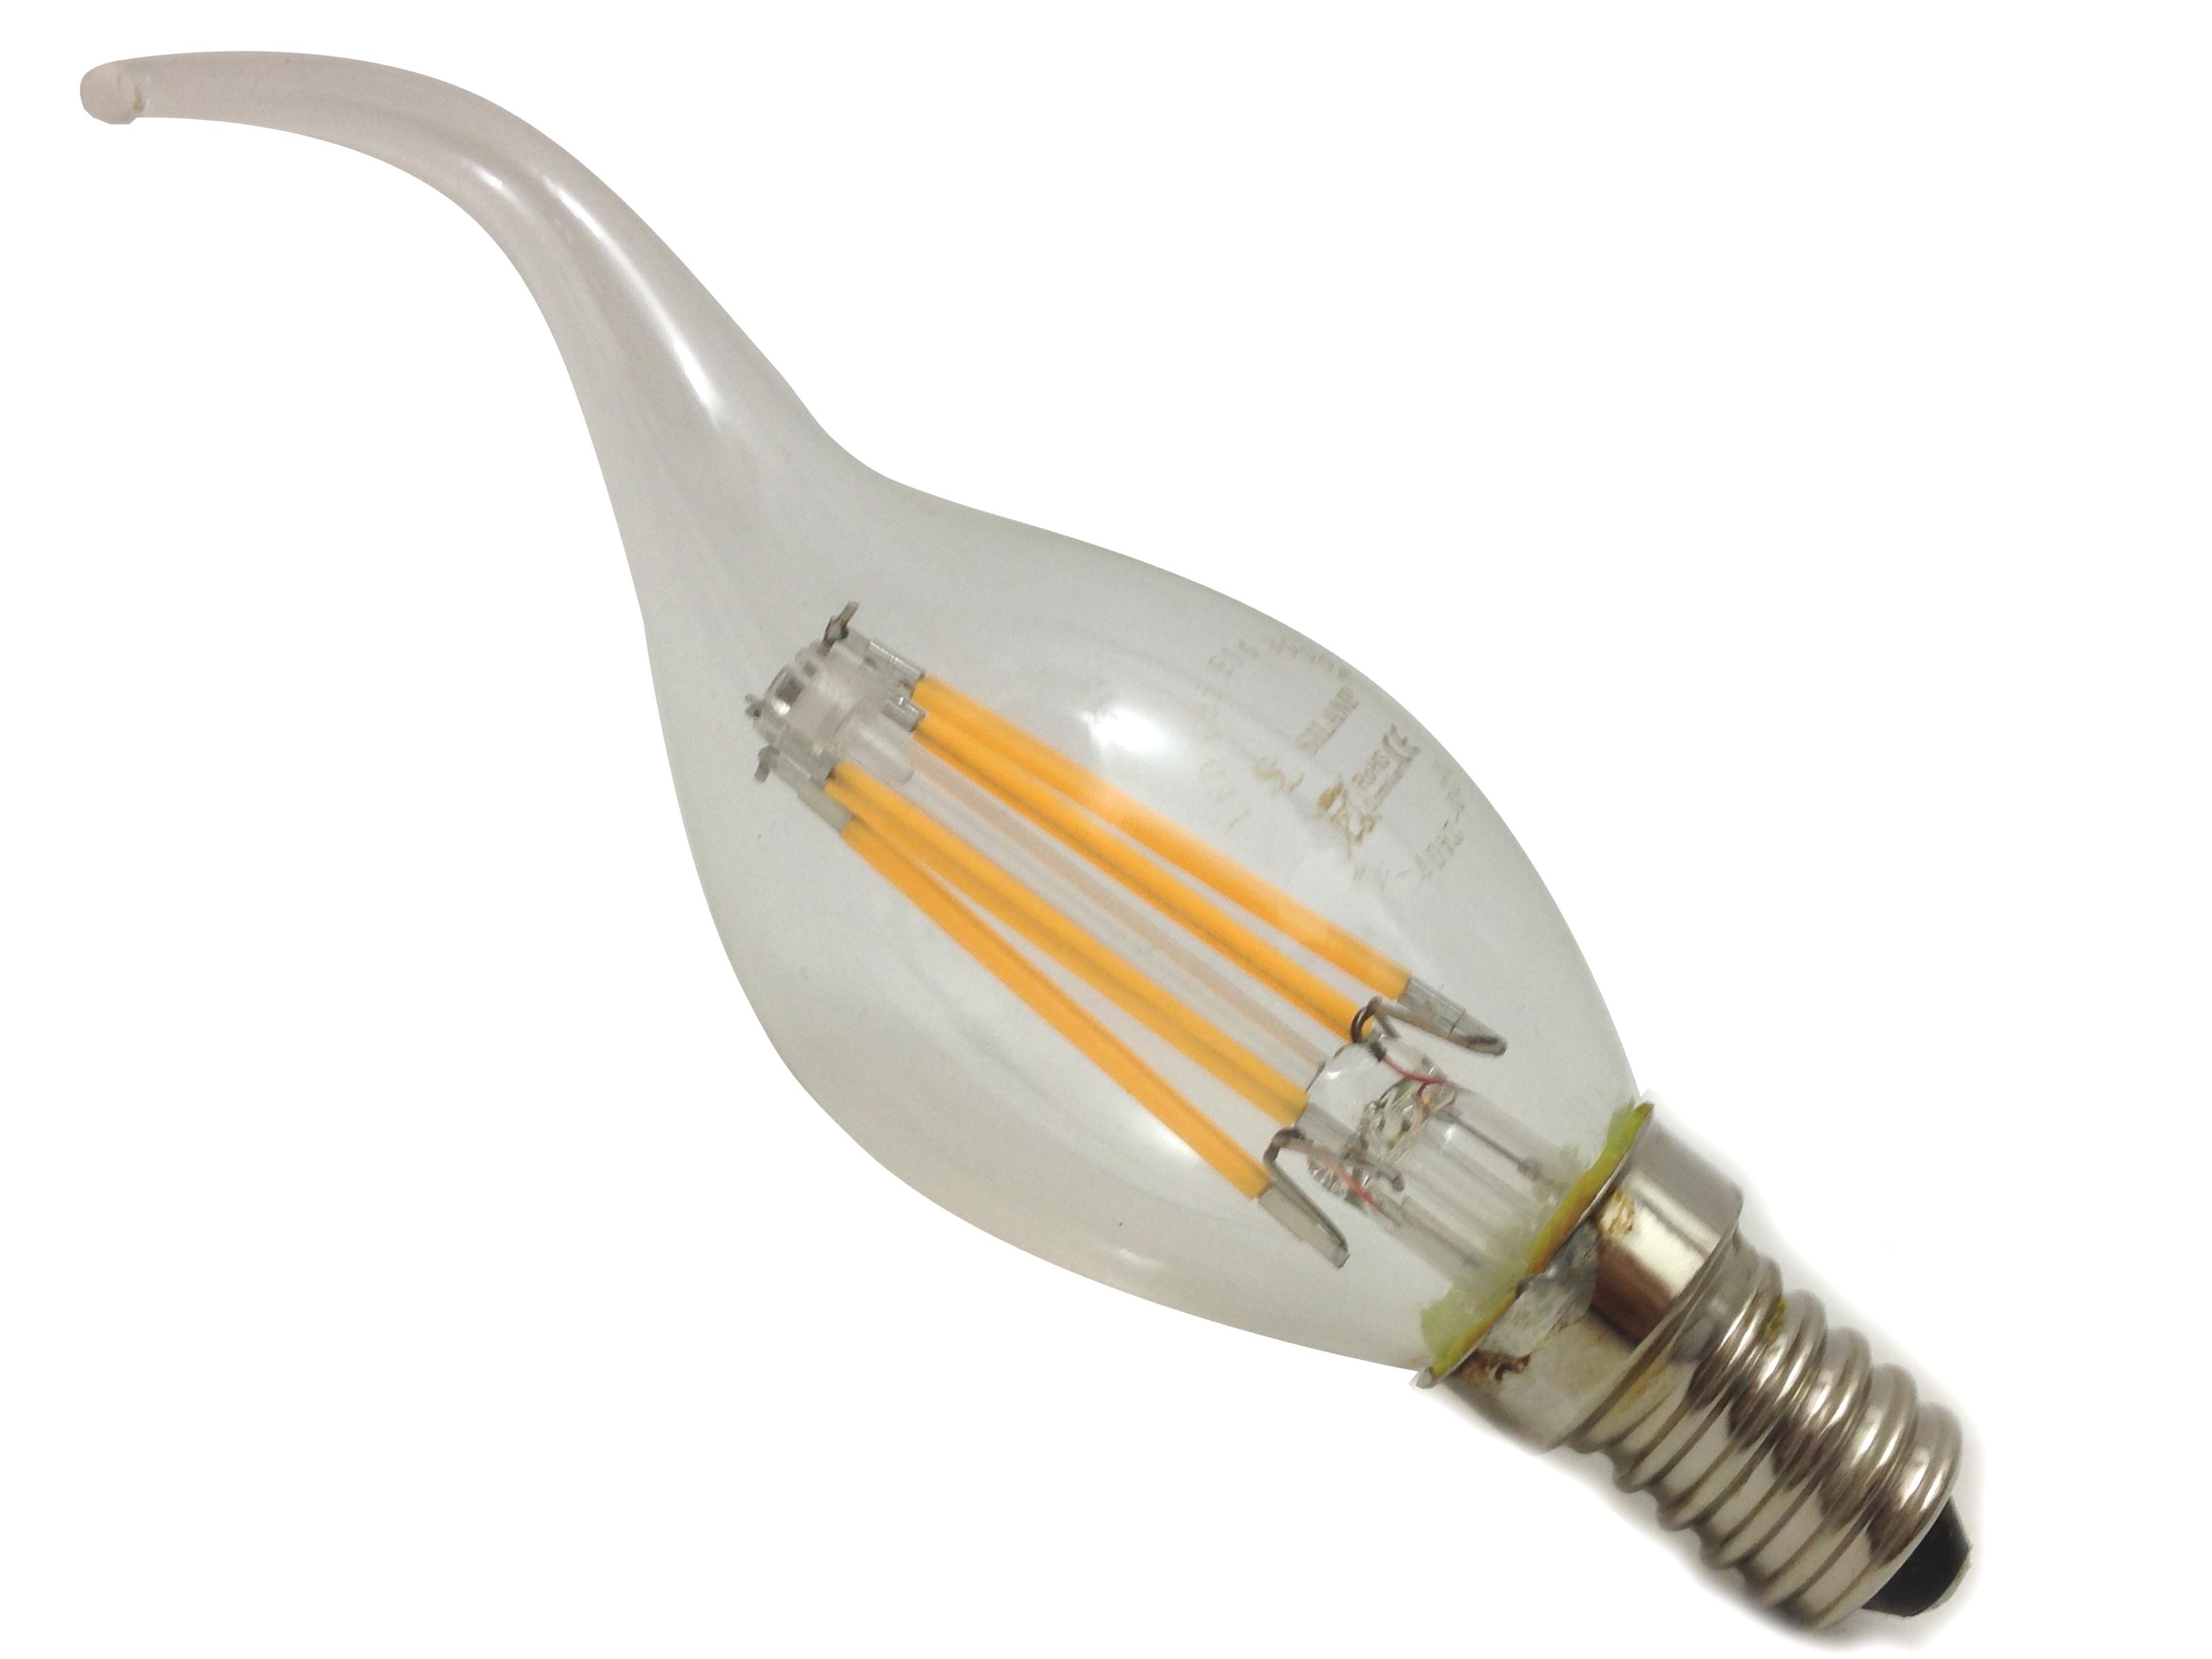 L1 6w offerte lampadine led silamp lampadine led for Offerte lampadine led